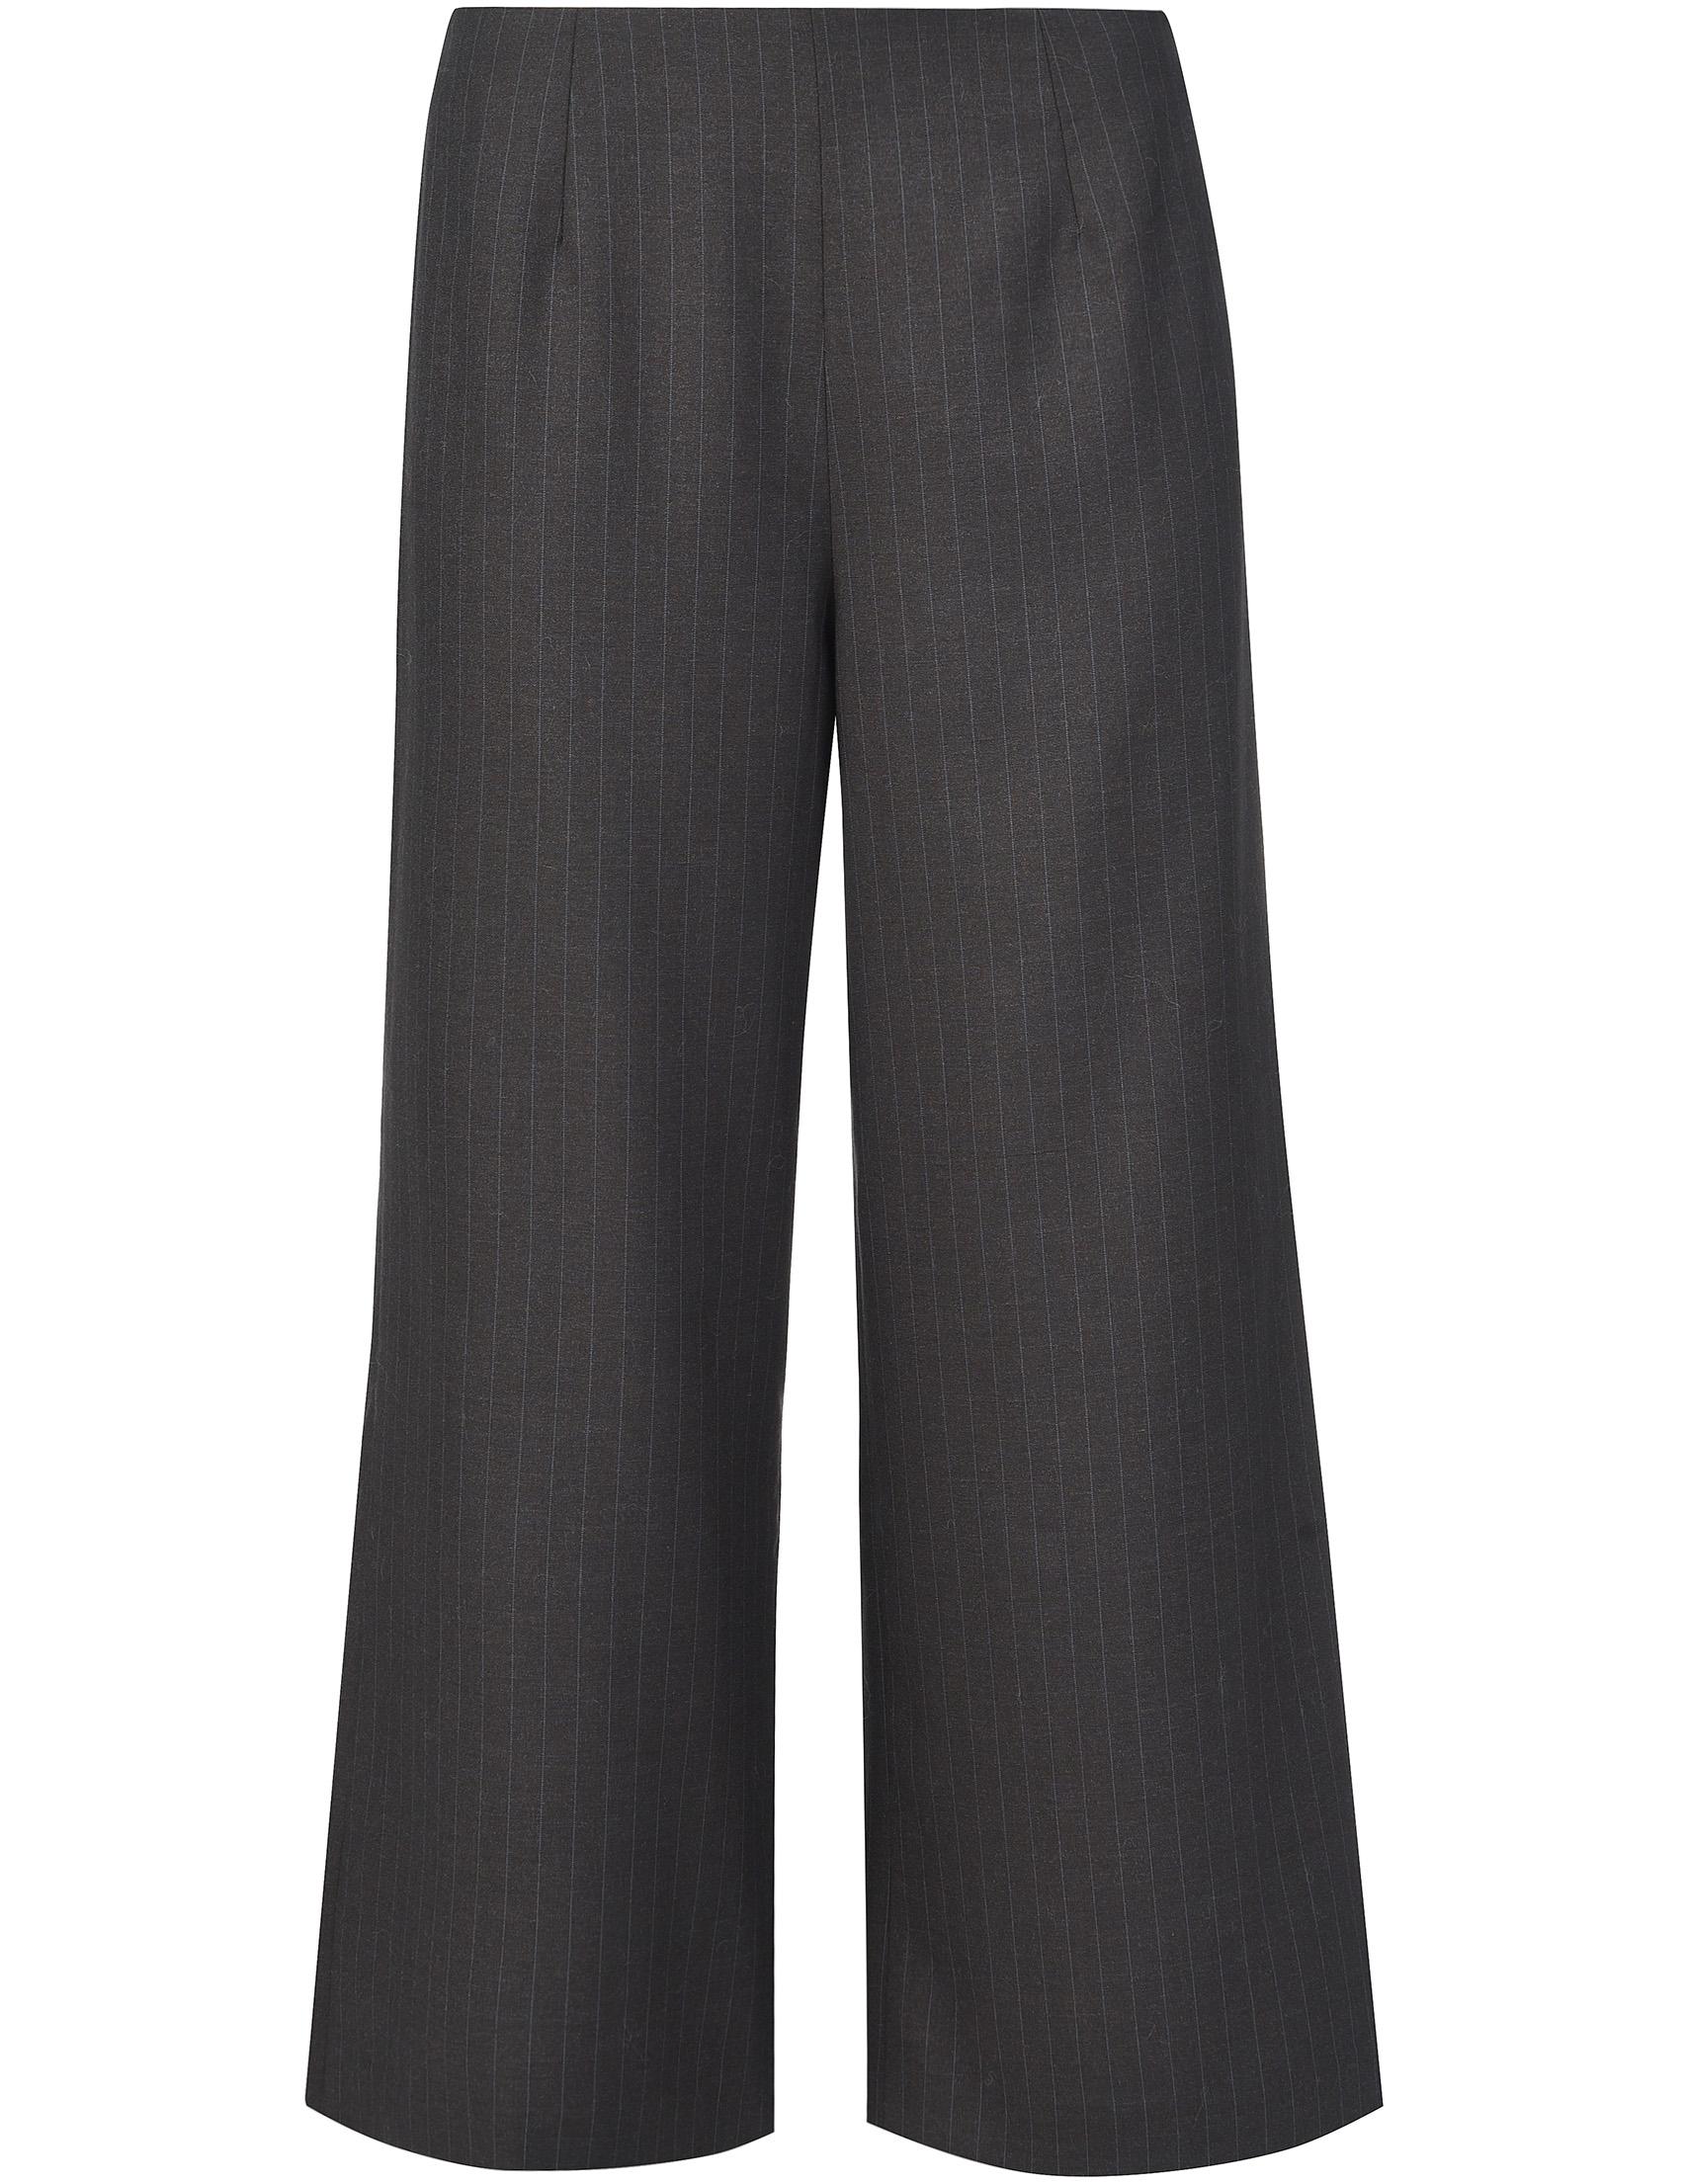 Женские брюки CA VAGAN 11626_gray